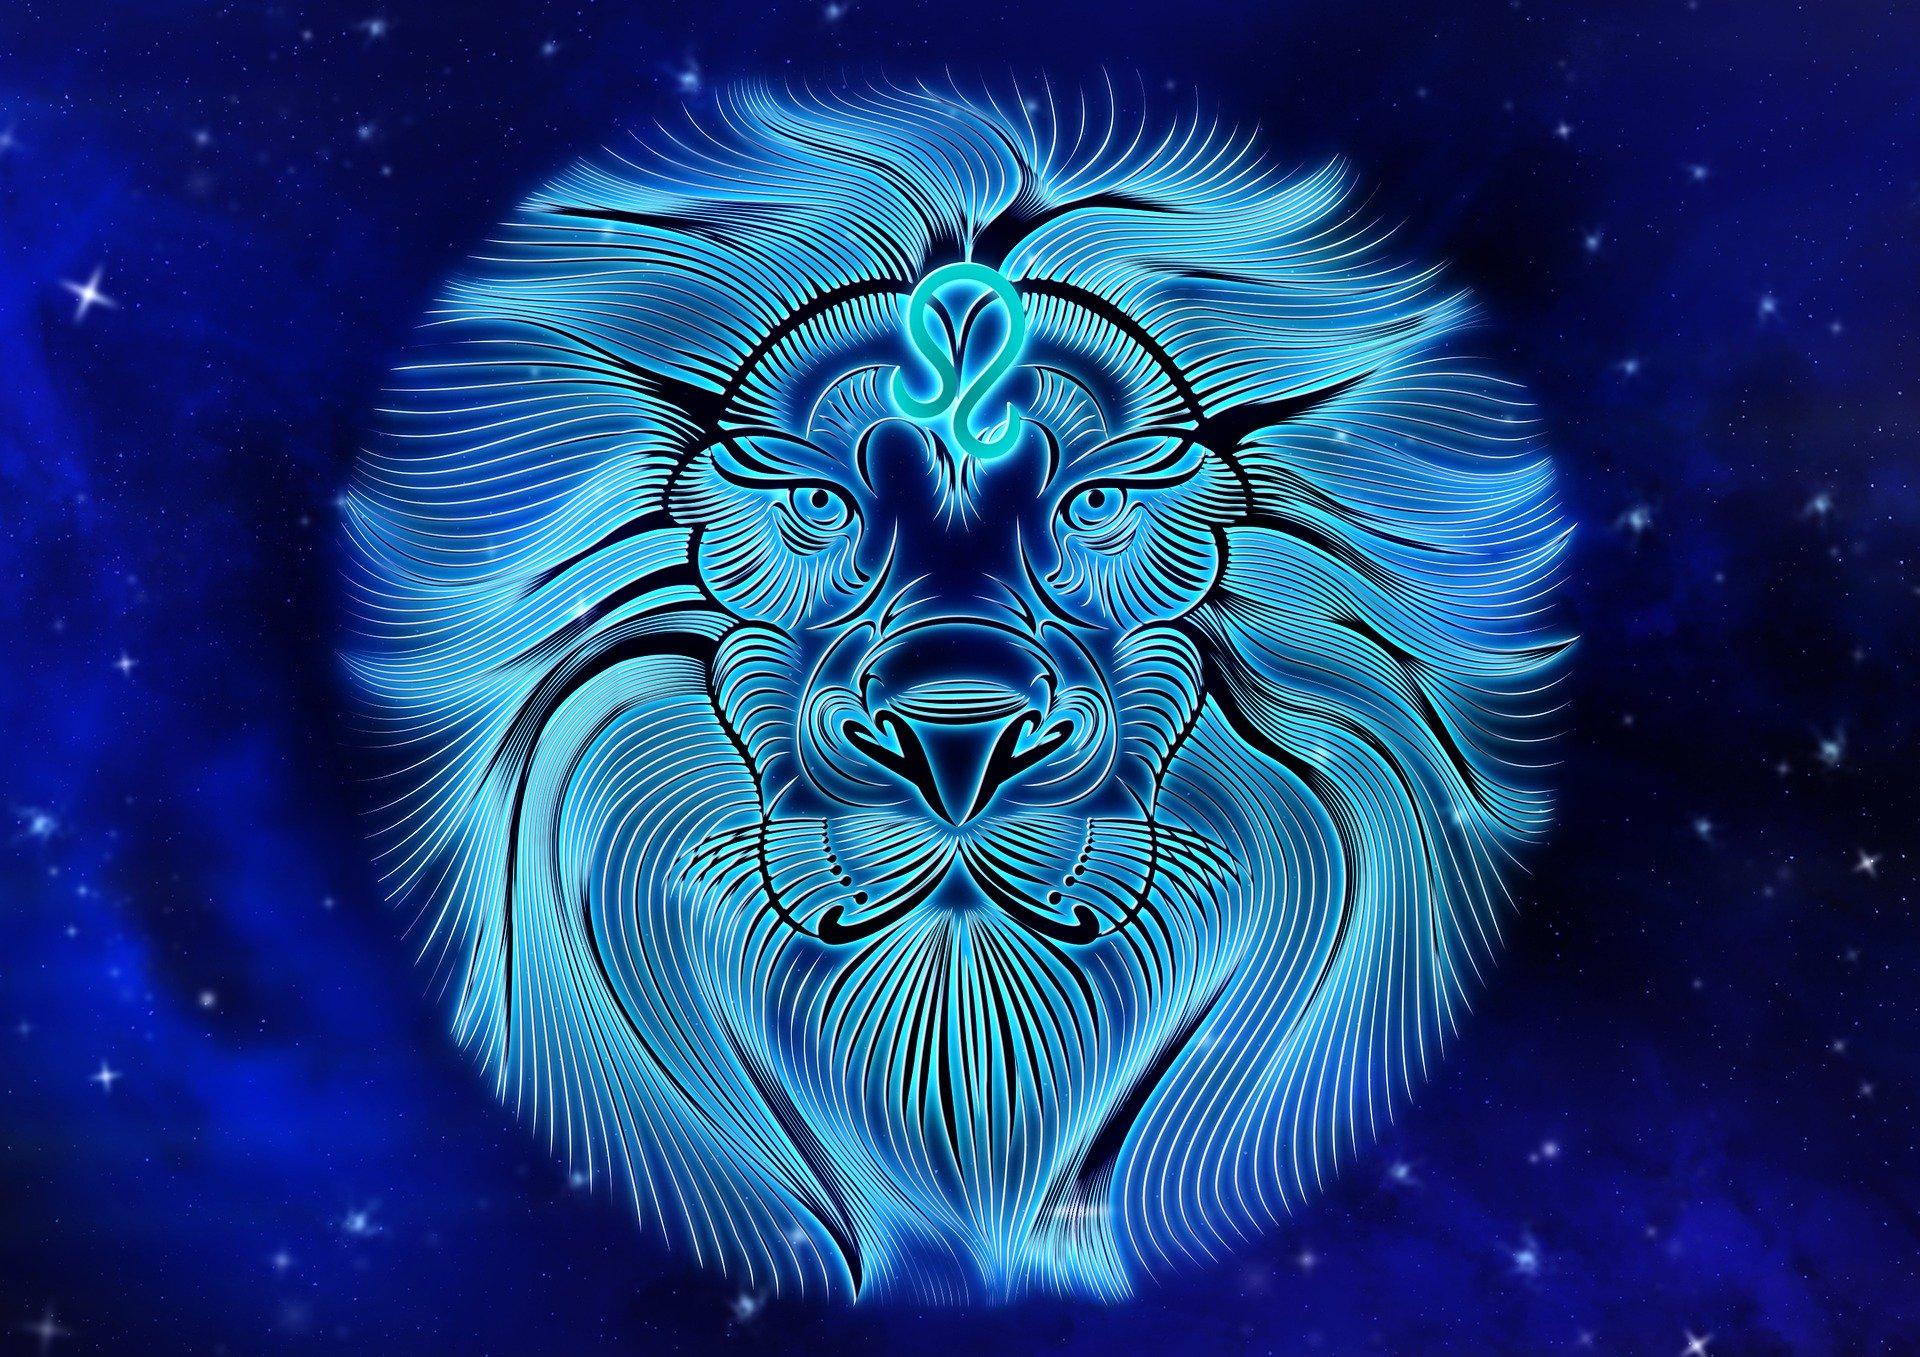 Horoscop anul 2013, anul Sarpelui de apa - zodia Leu